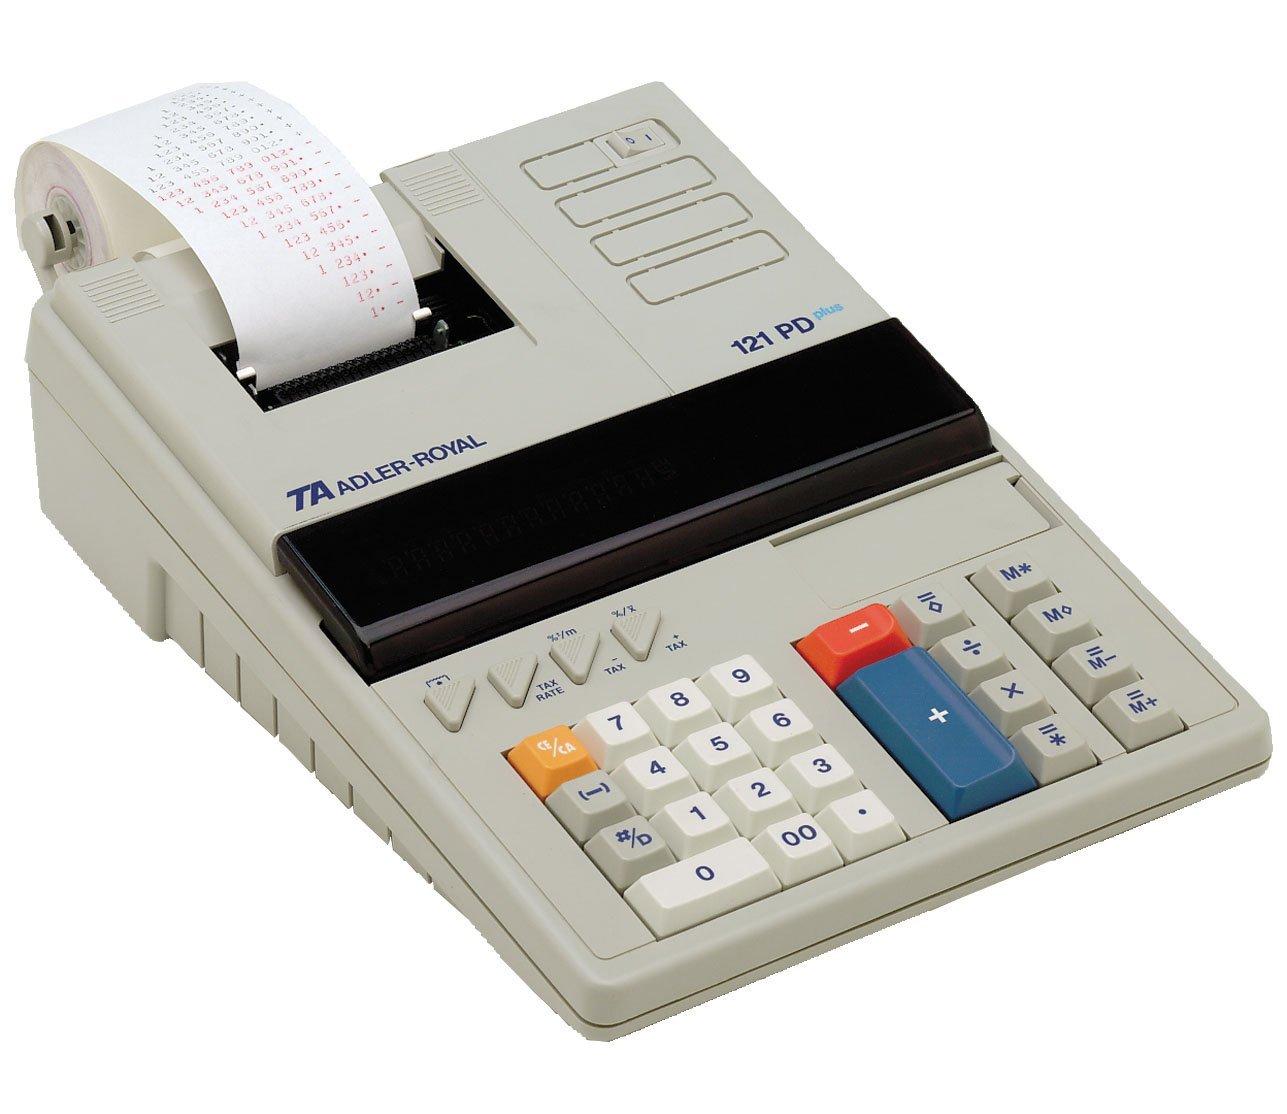 Adler 121pd 12 Digit Calculator